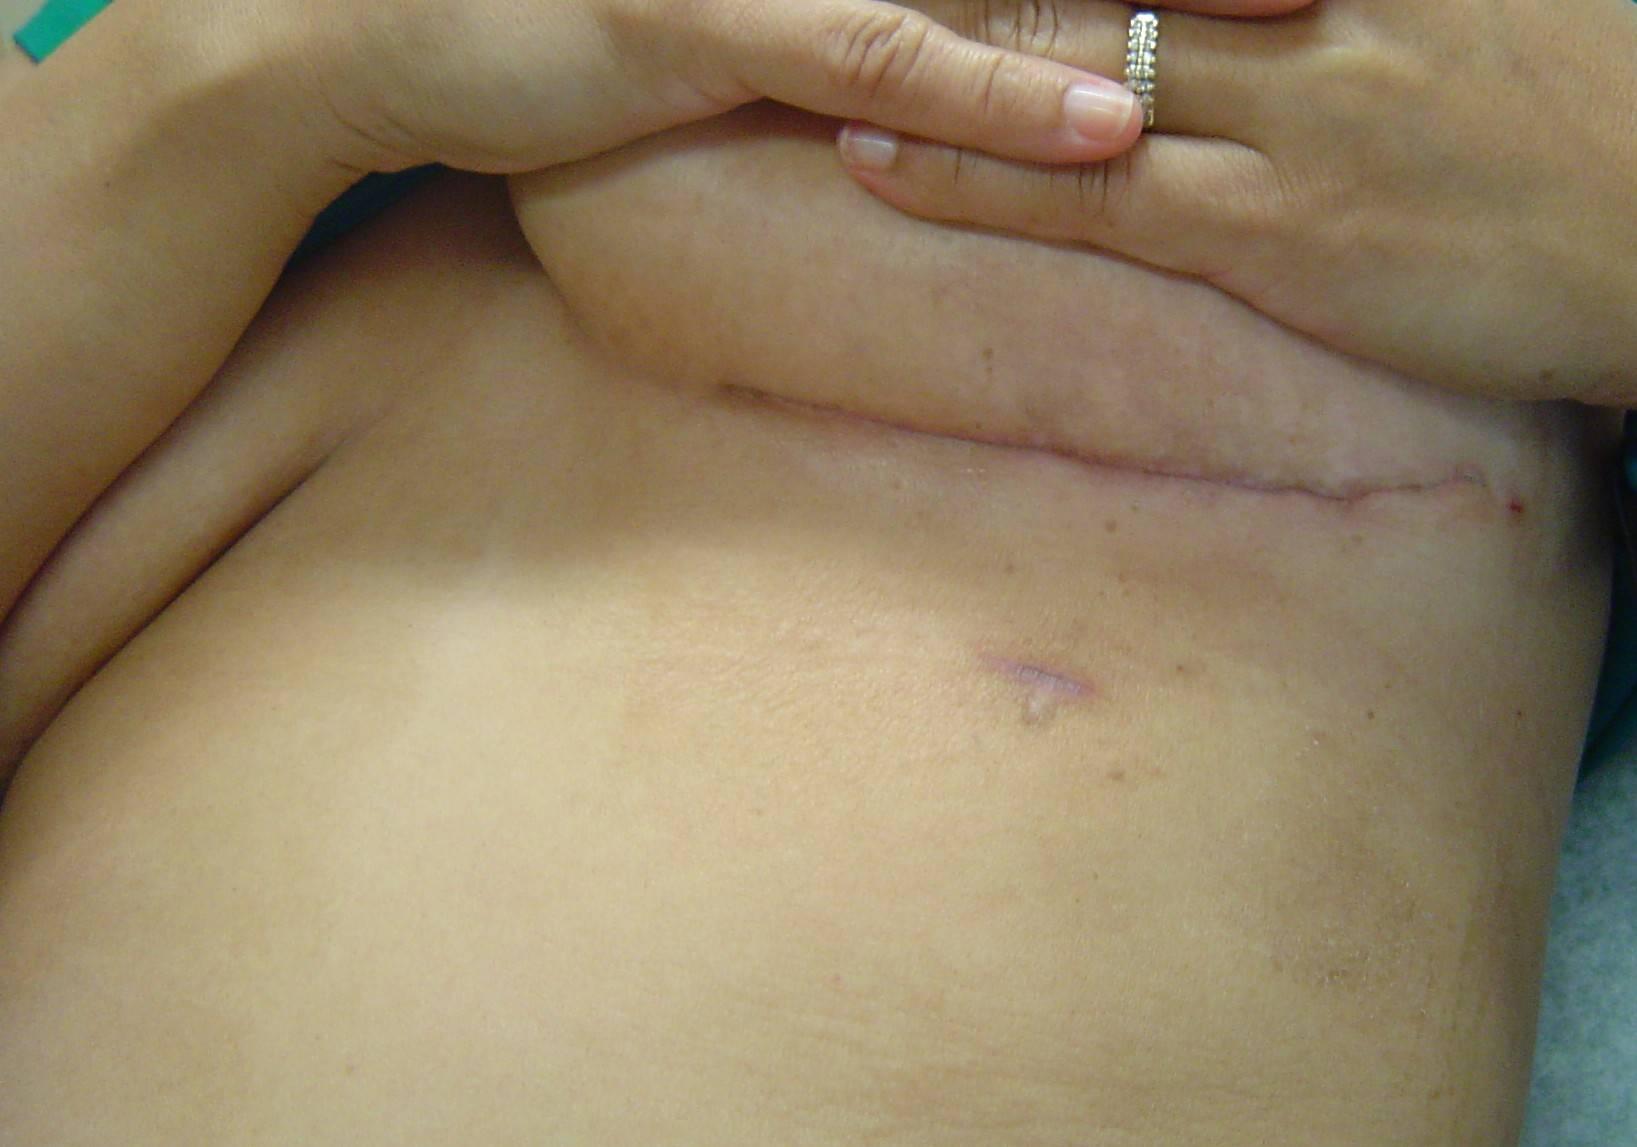 Удаление фиброаденомы молочной железы